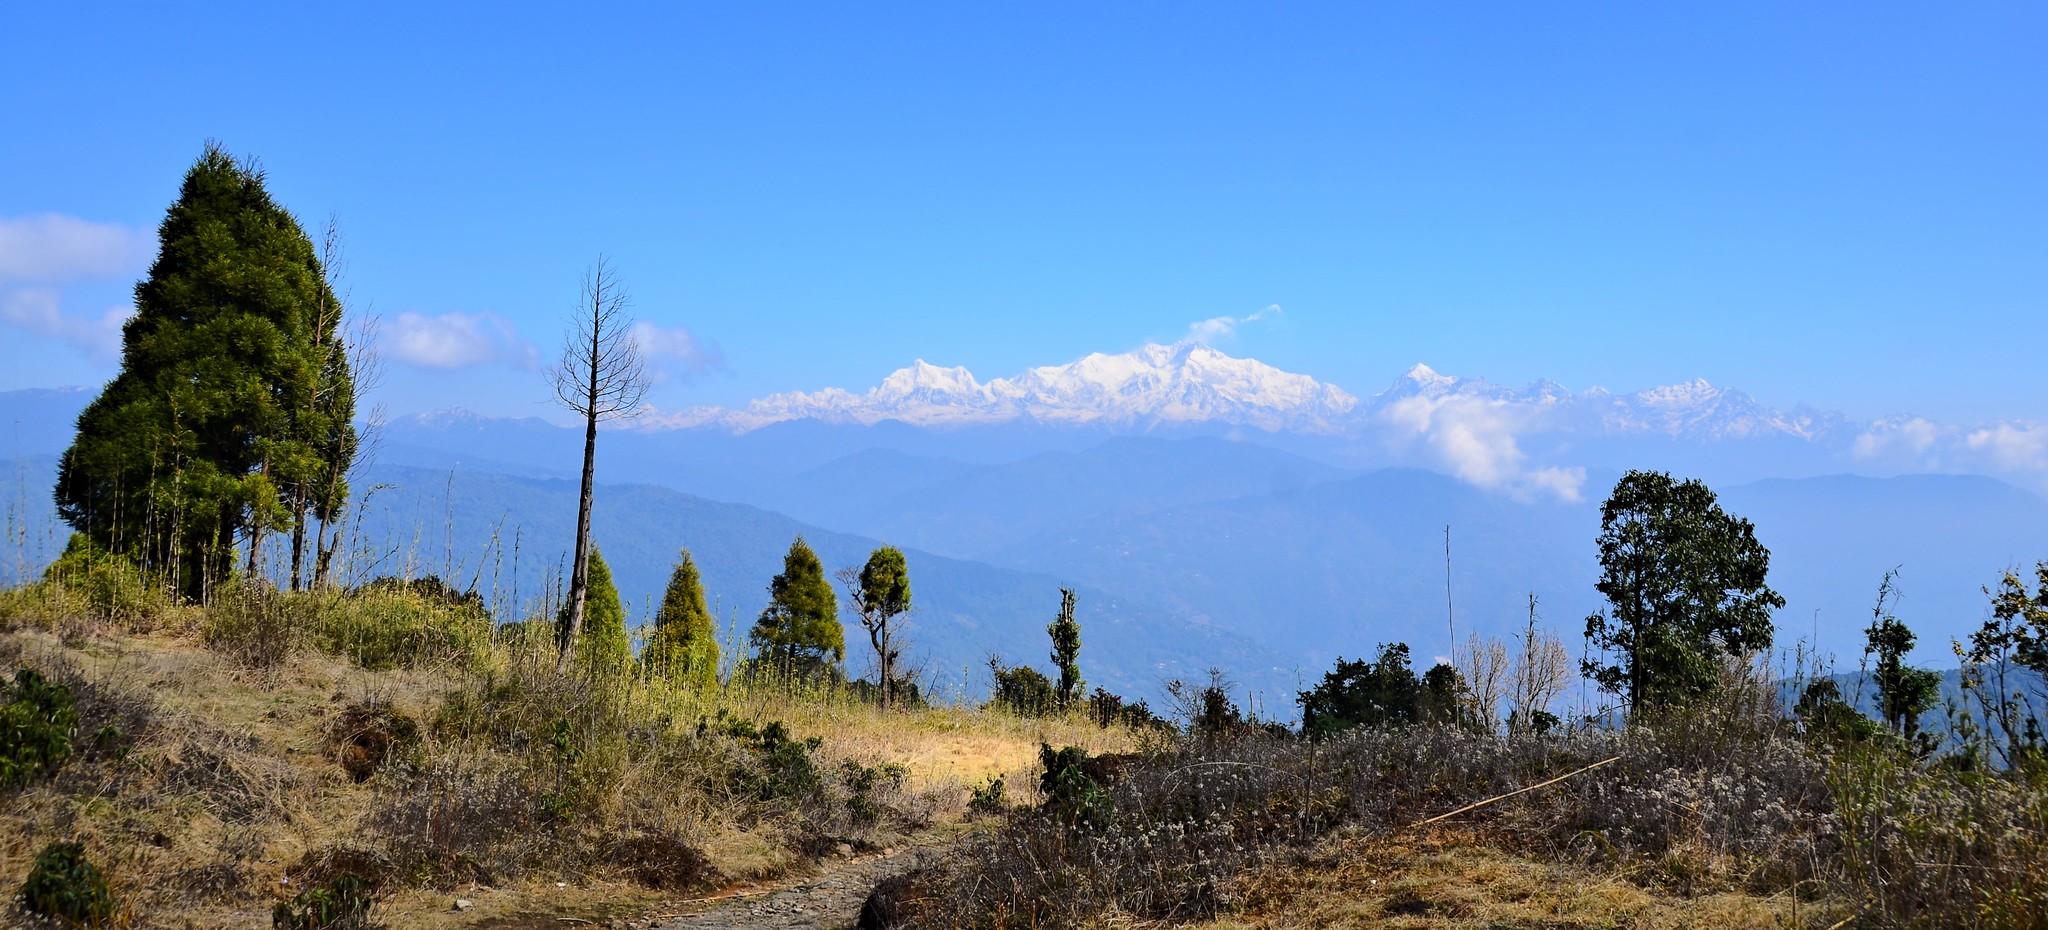 Shree Antu Homestay, Kanchenjunga and Ilam Tea Gardens